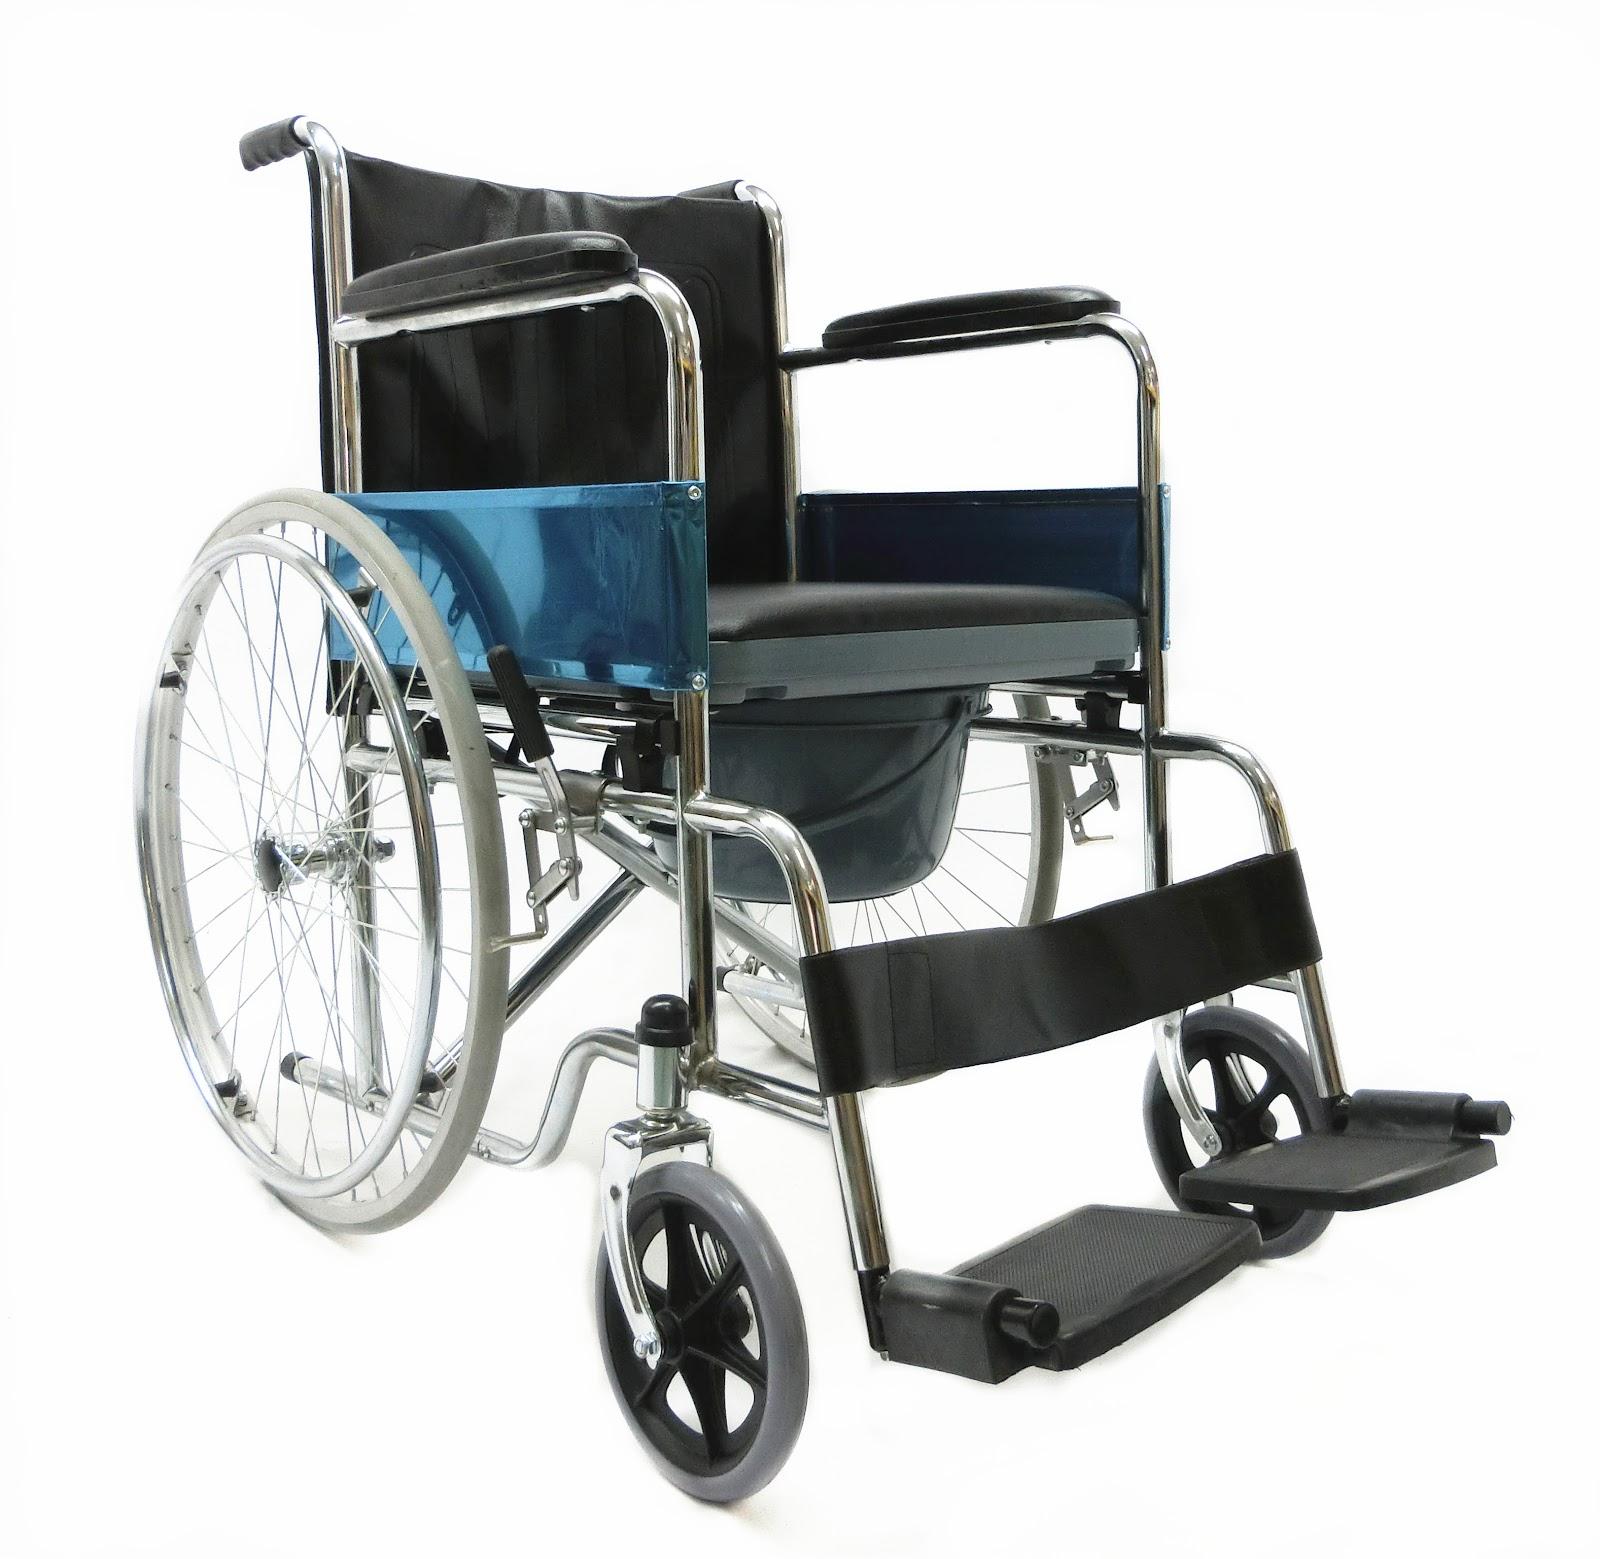 shower chair malaysia stormtrooper adirondack wheelchair store shop in bukit mertajam perai